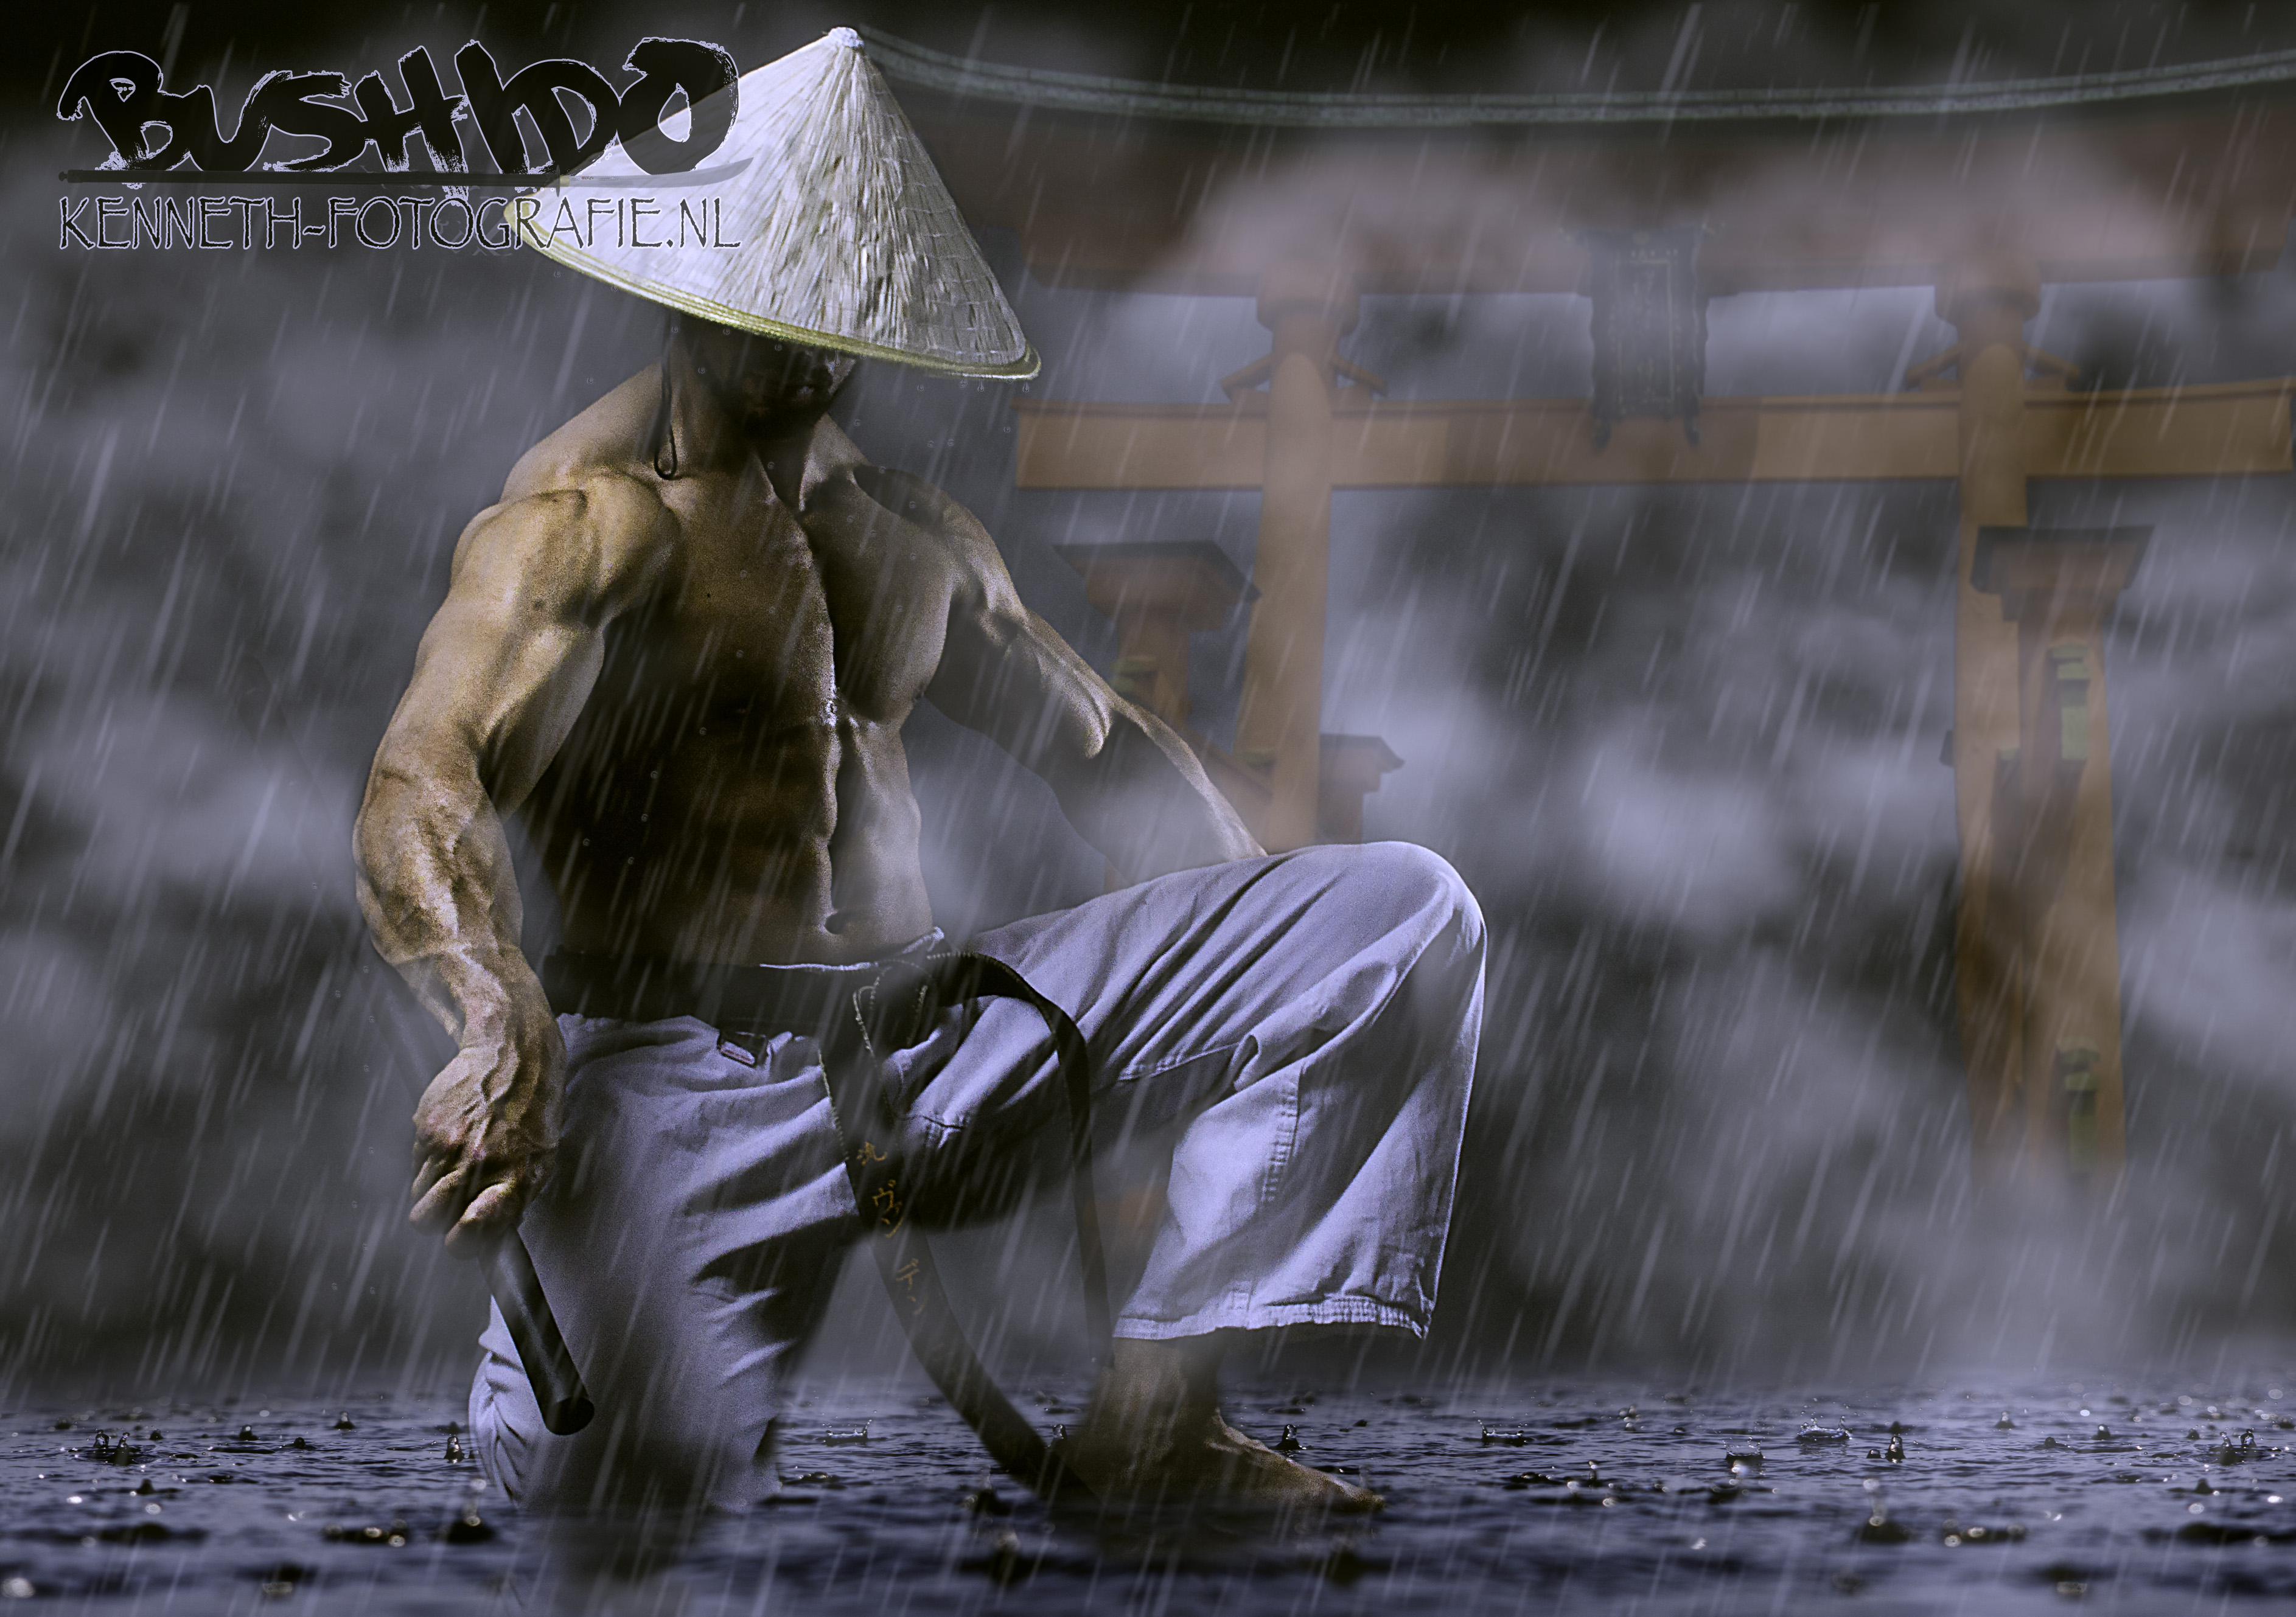 Bushido (vechtsport fotografie)